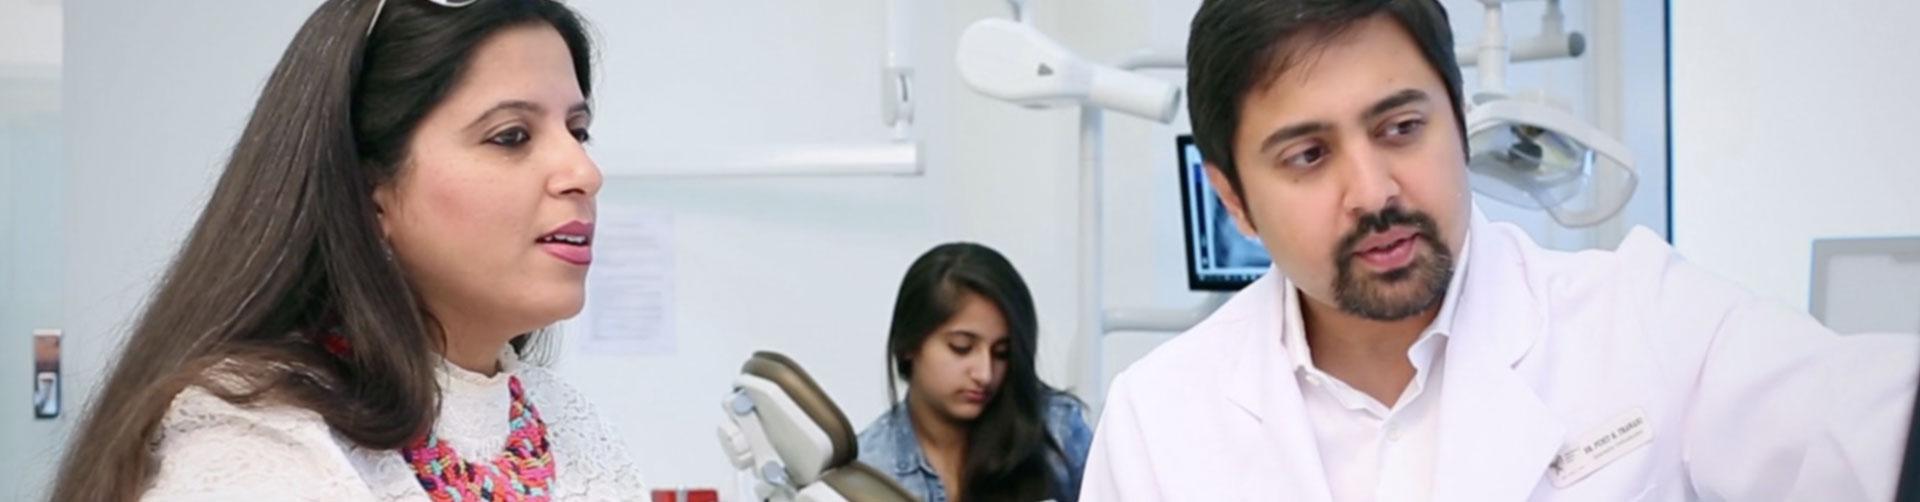 Dr. Punit thawani talking to patient